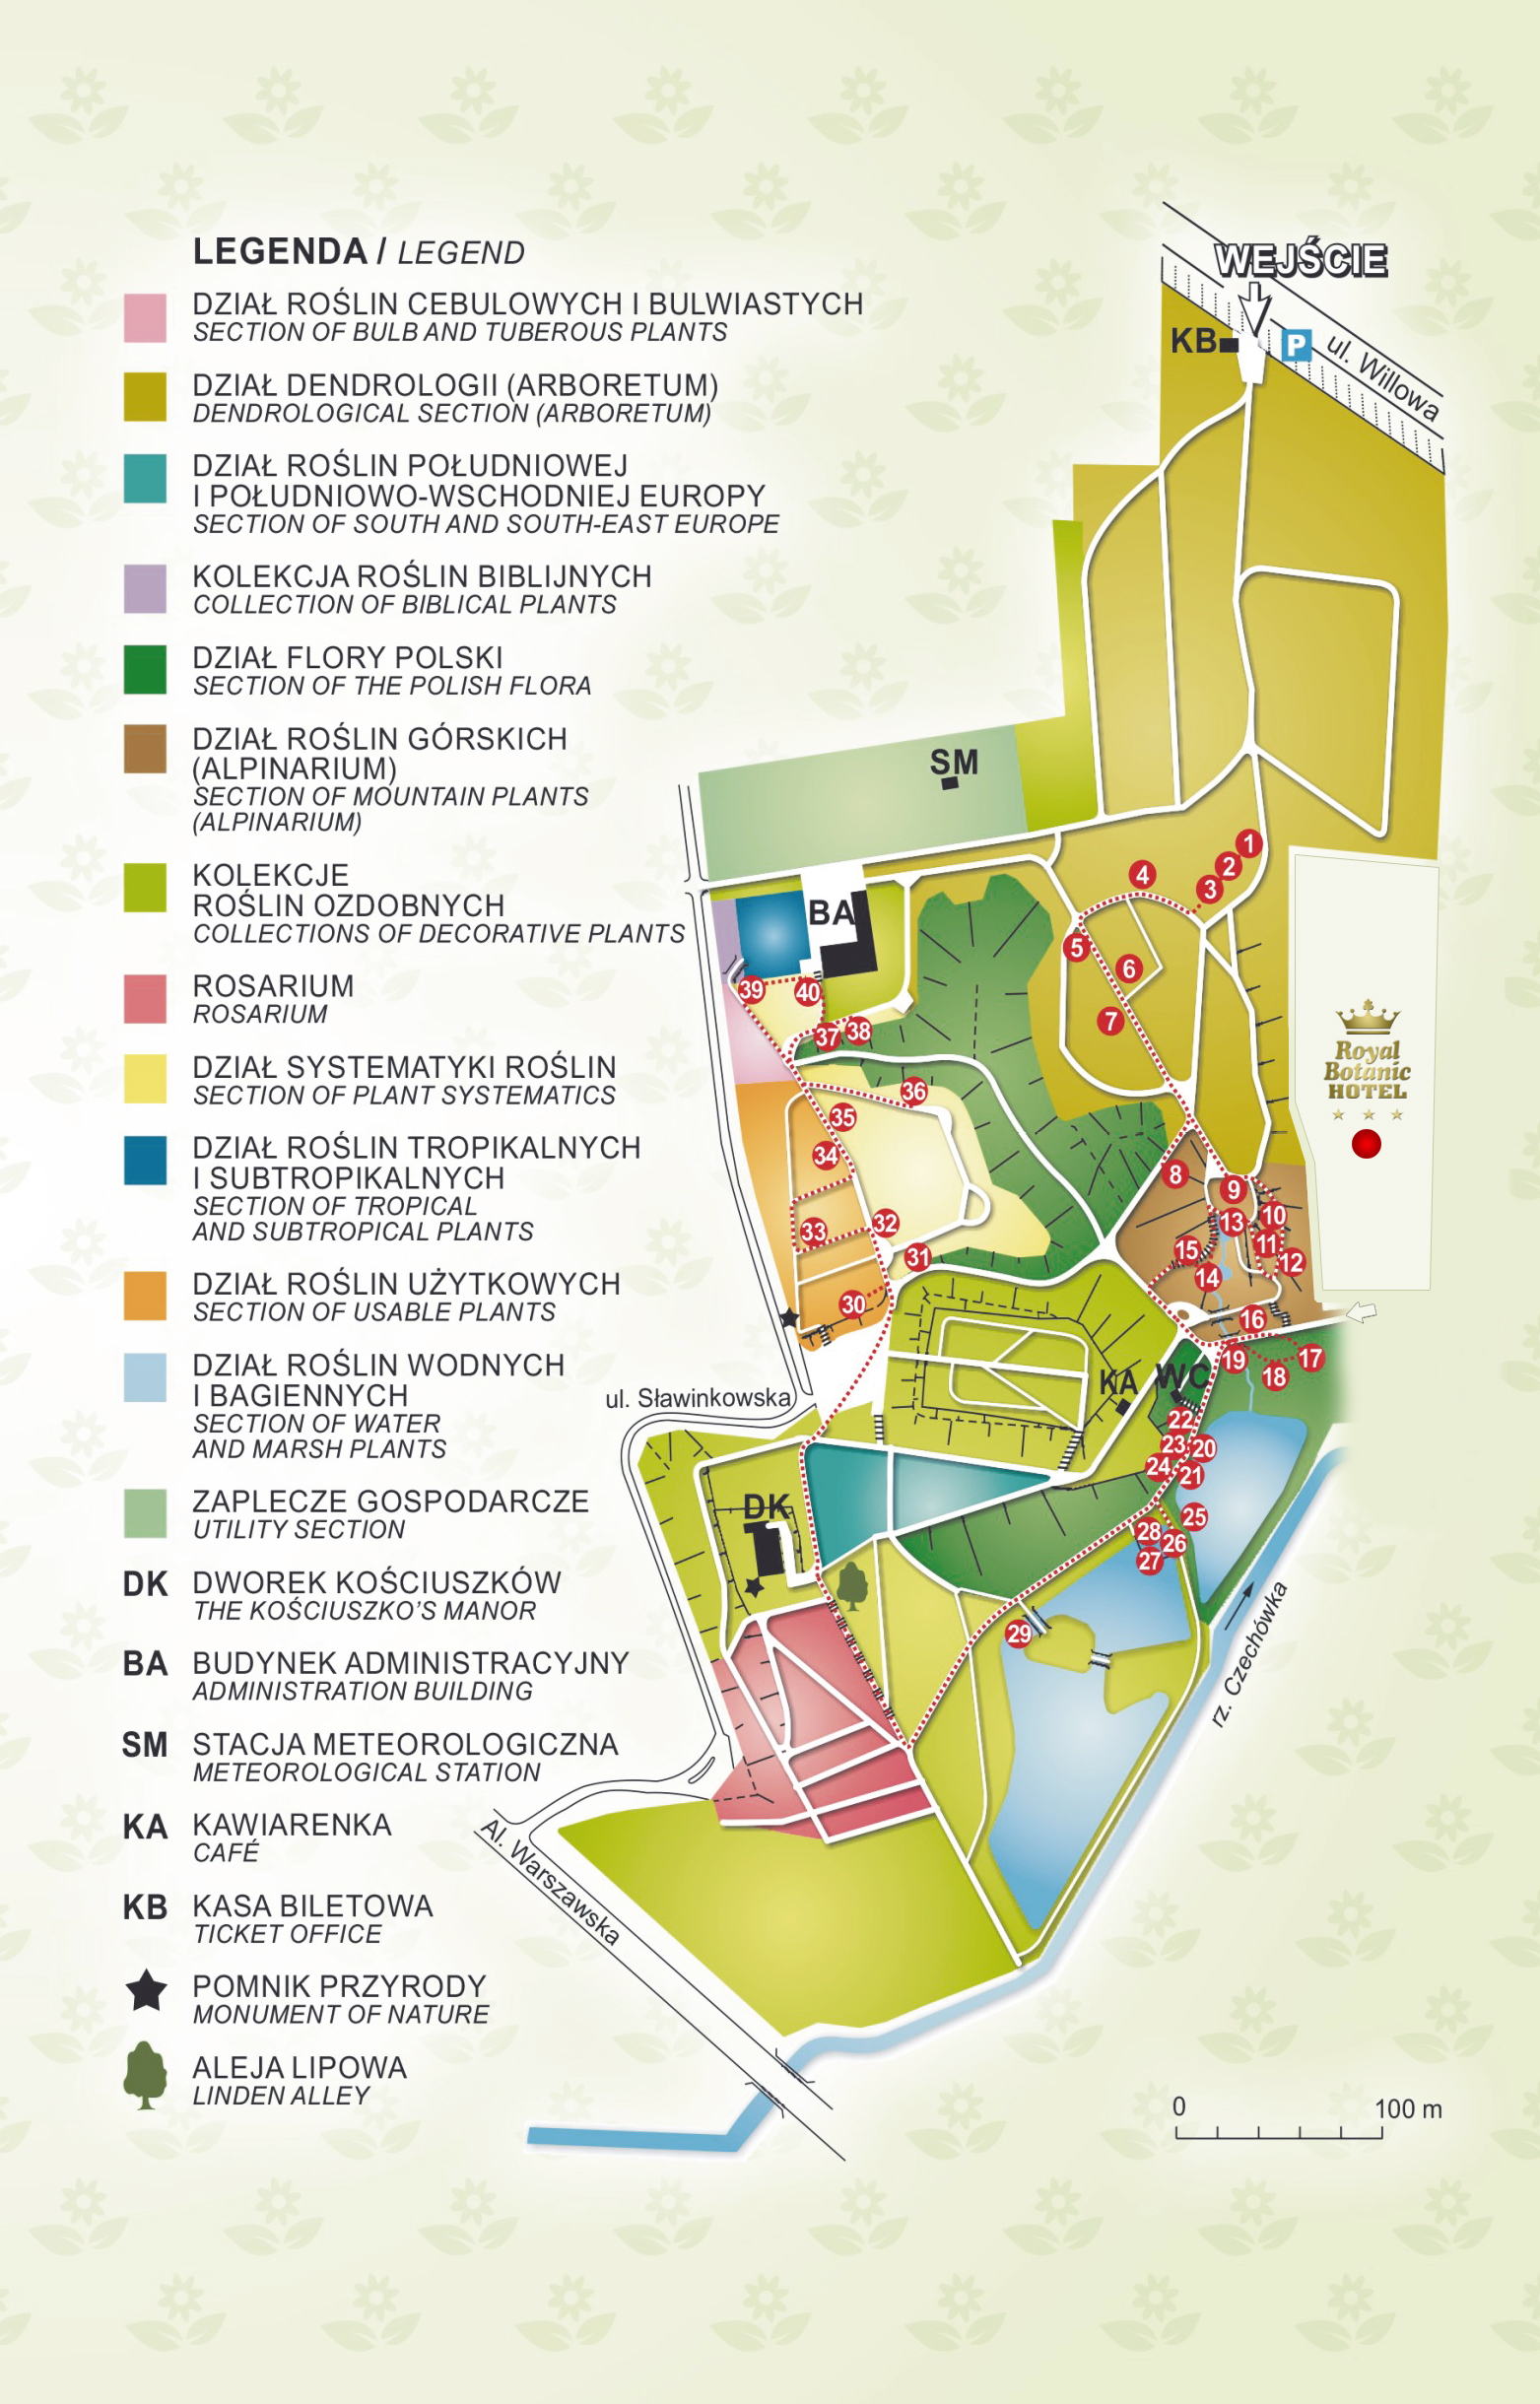 Ogród Botaniczny Hotel Royal Botanic Lublin